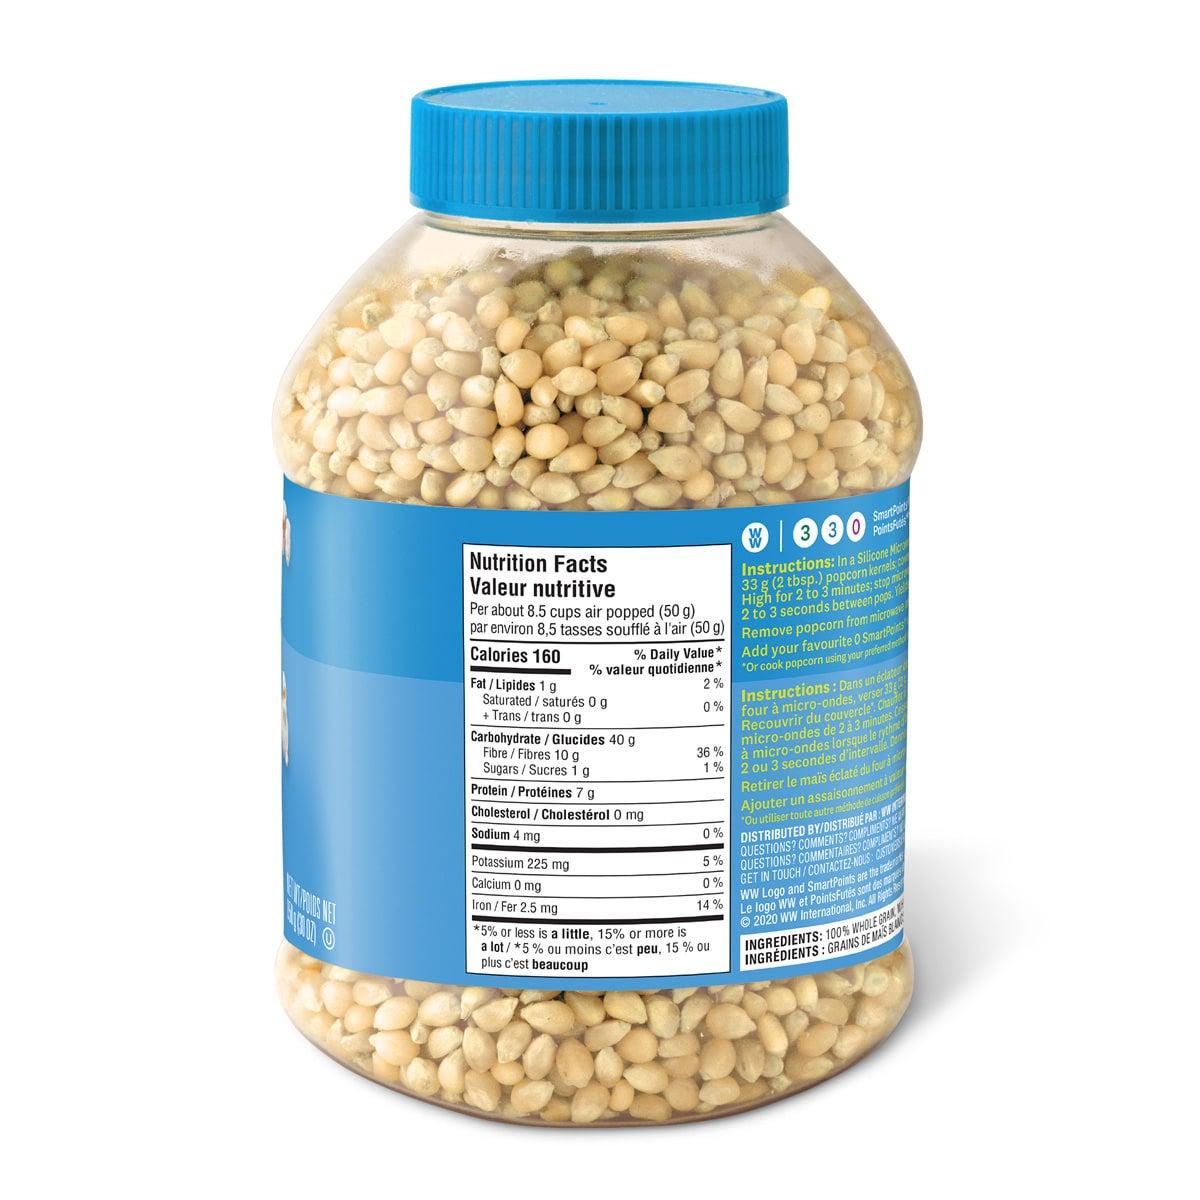 Premium white popcorn kernels - nutrition label